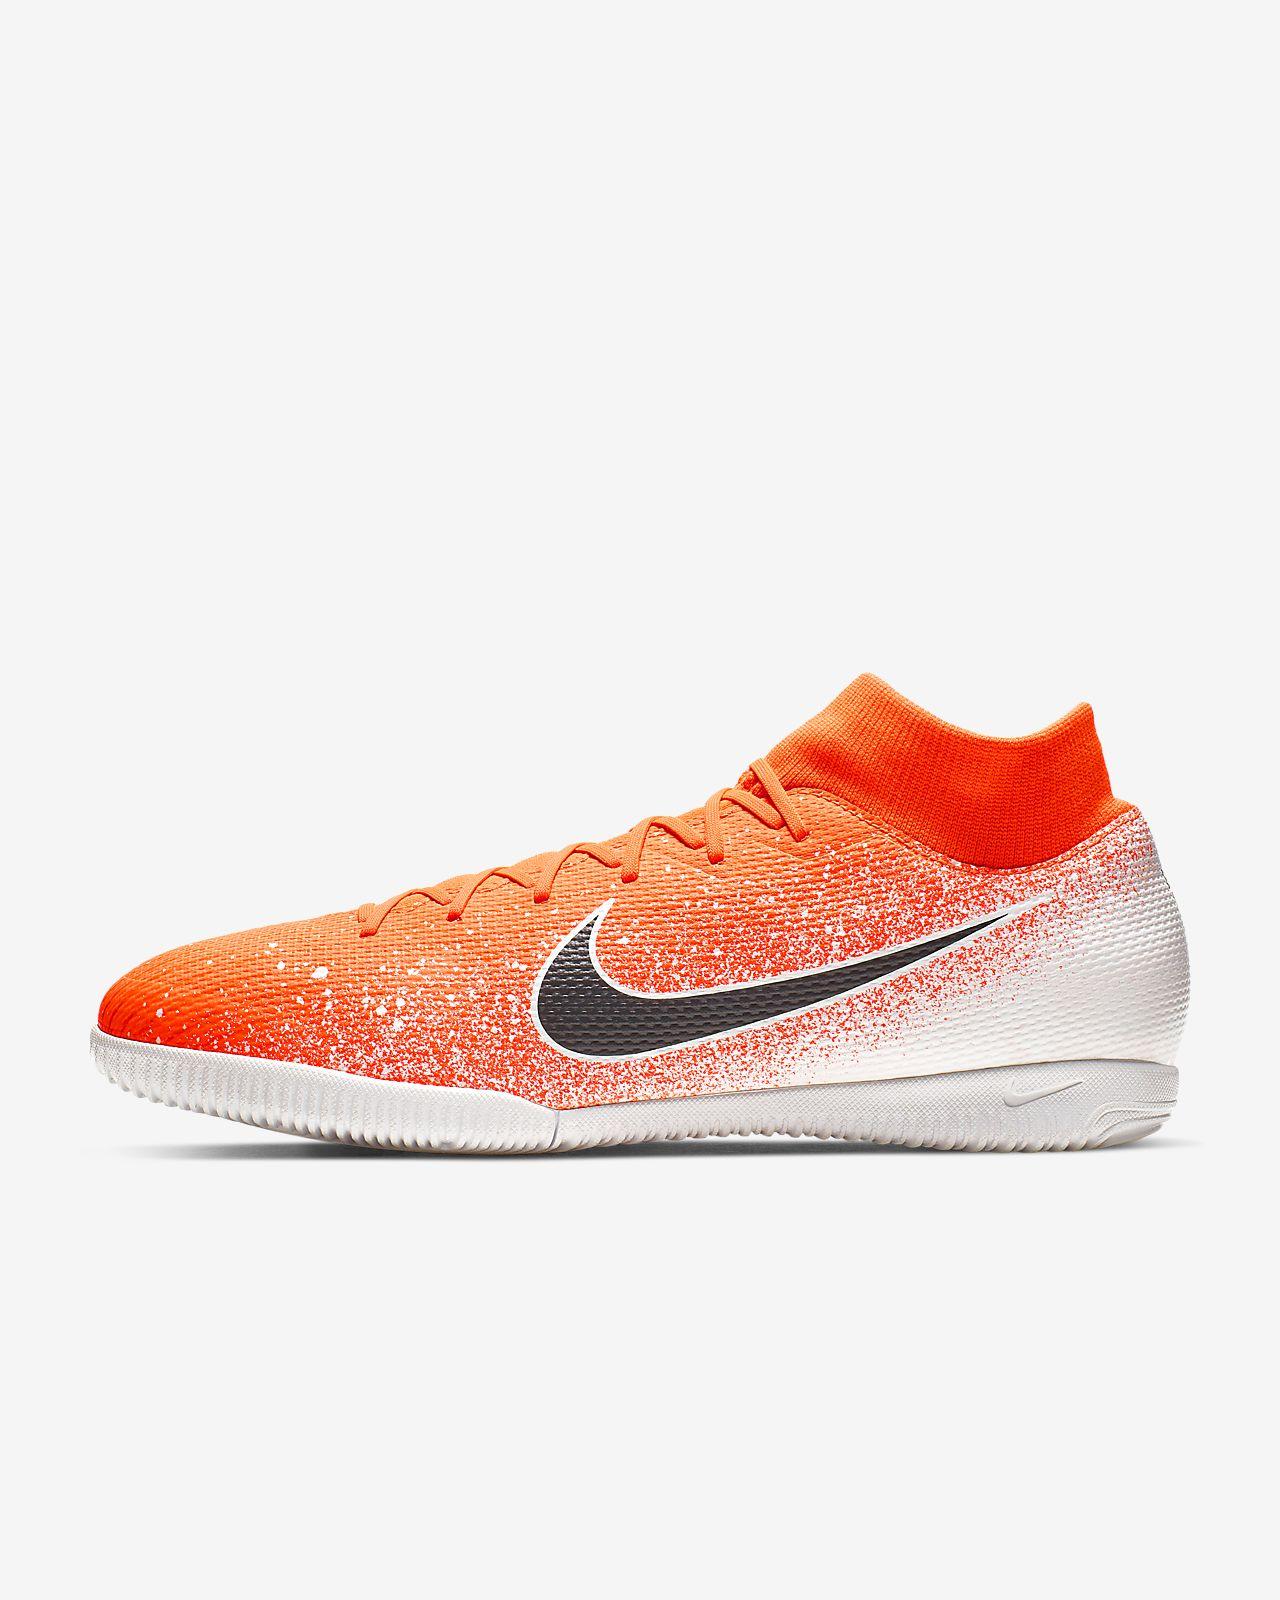 new concept 30f2b 67b22 ... Chaussure de football en salle à crampons Nike SuperflyX 6 Academy IC